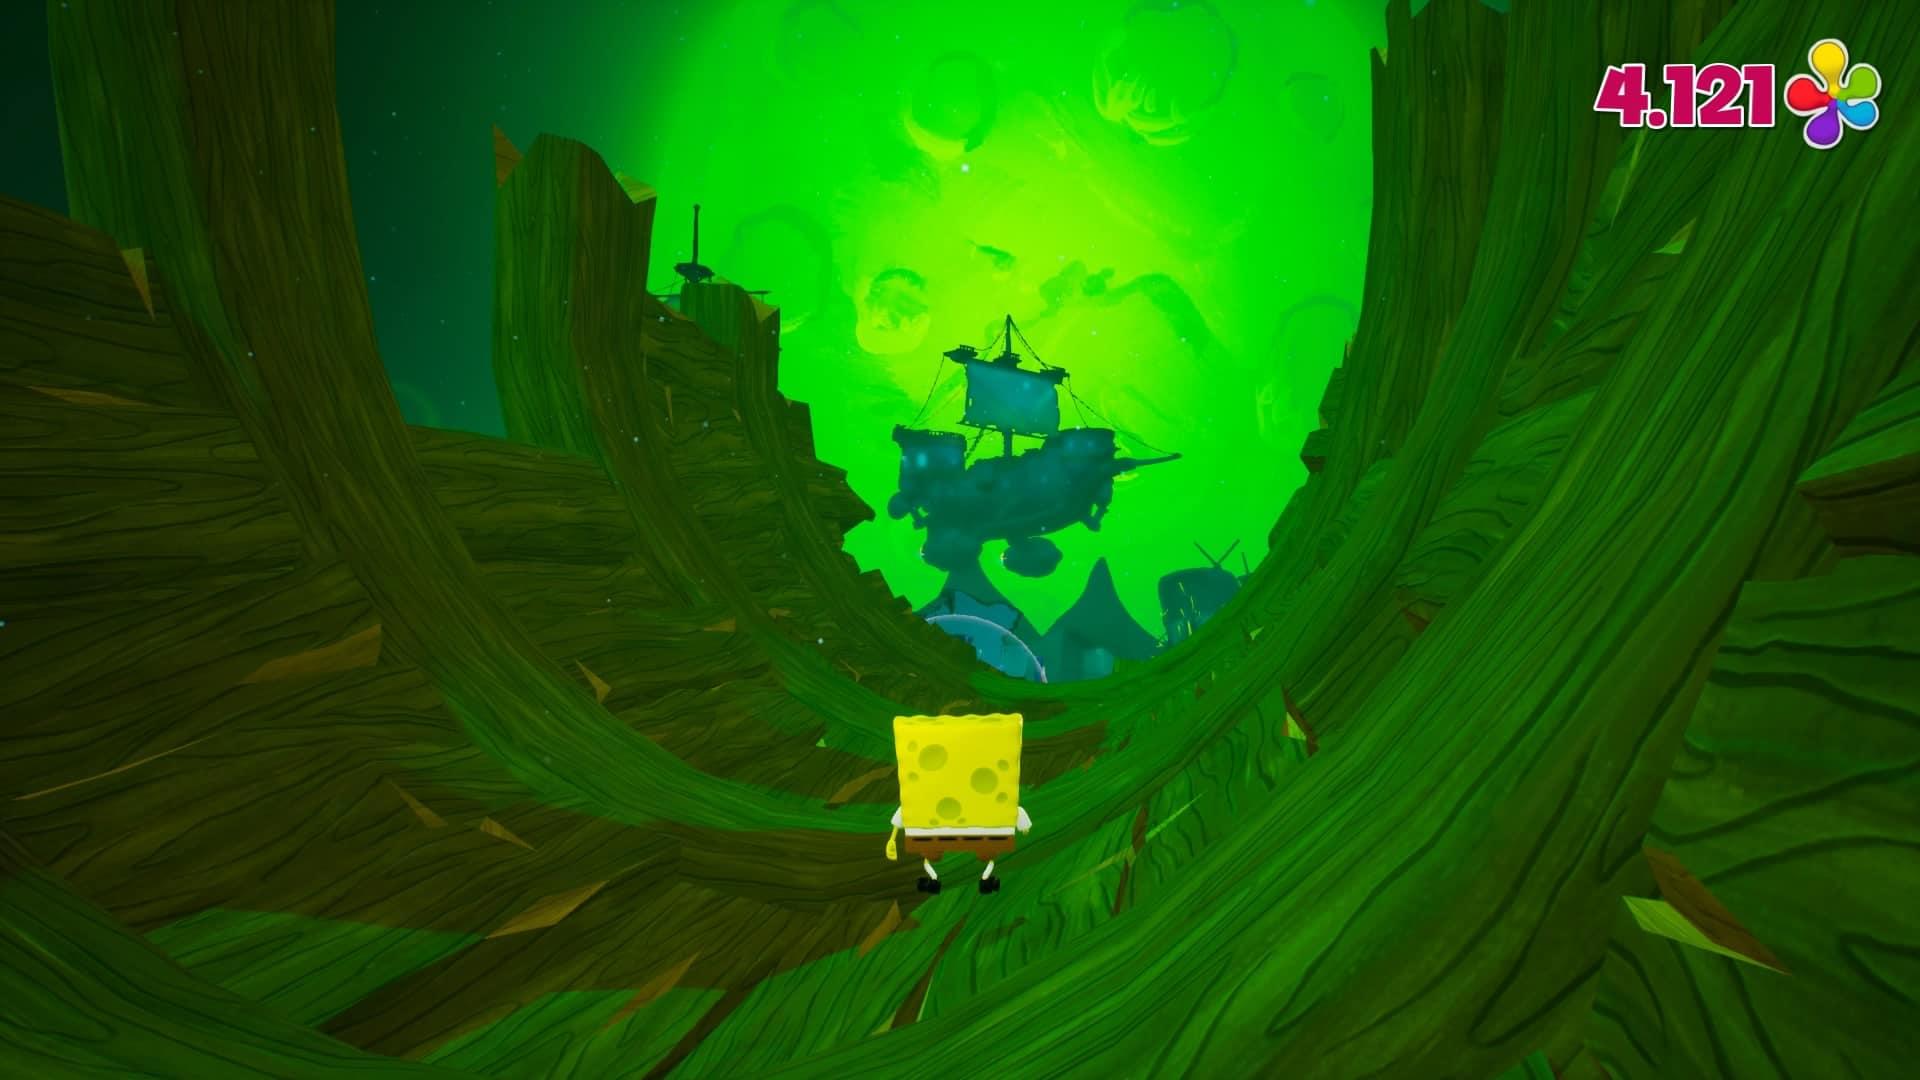 SpongeBob SquarePants: Battle for Bikini Bottom - Rehydrated: vale a pena? 5